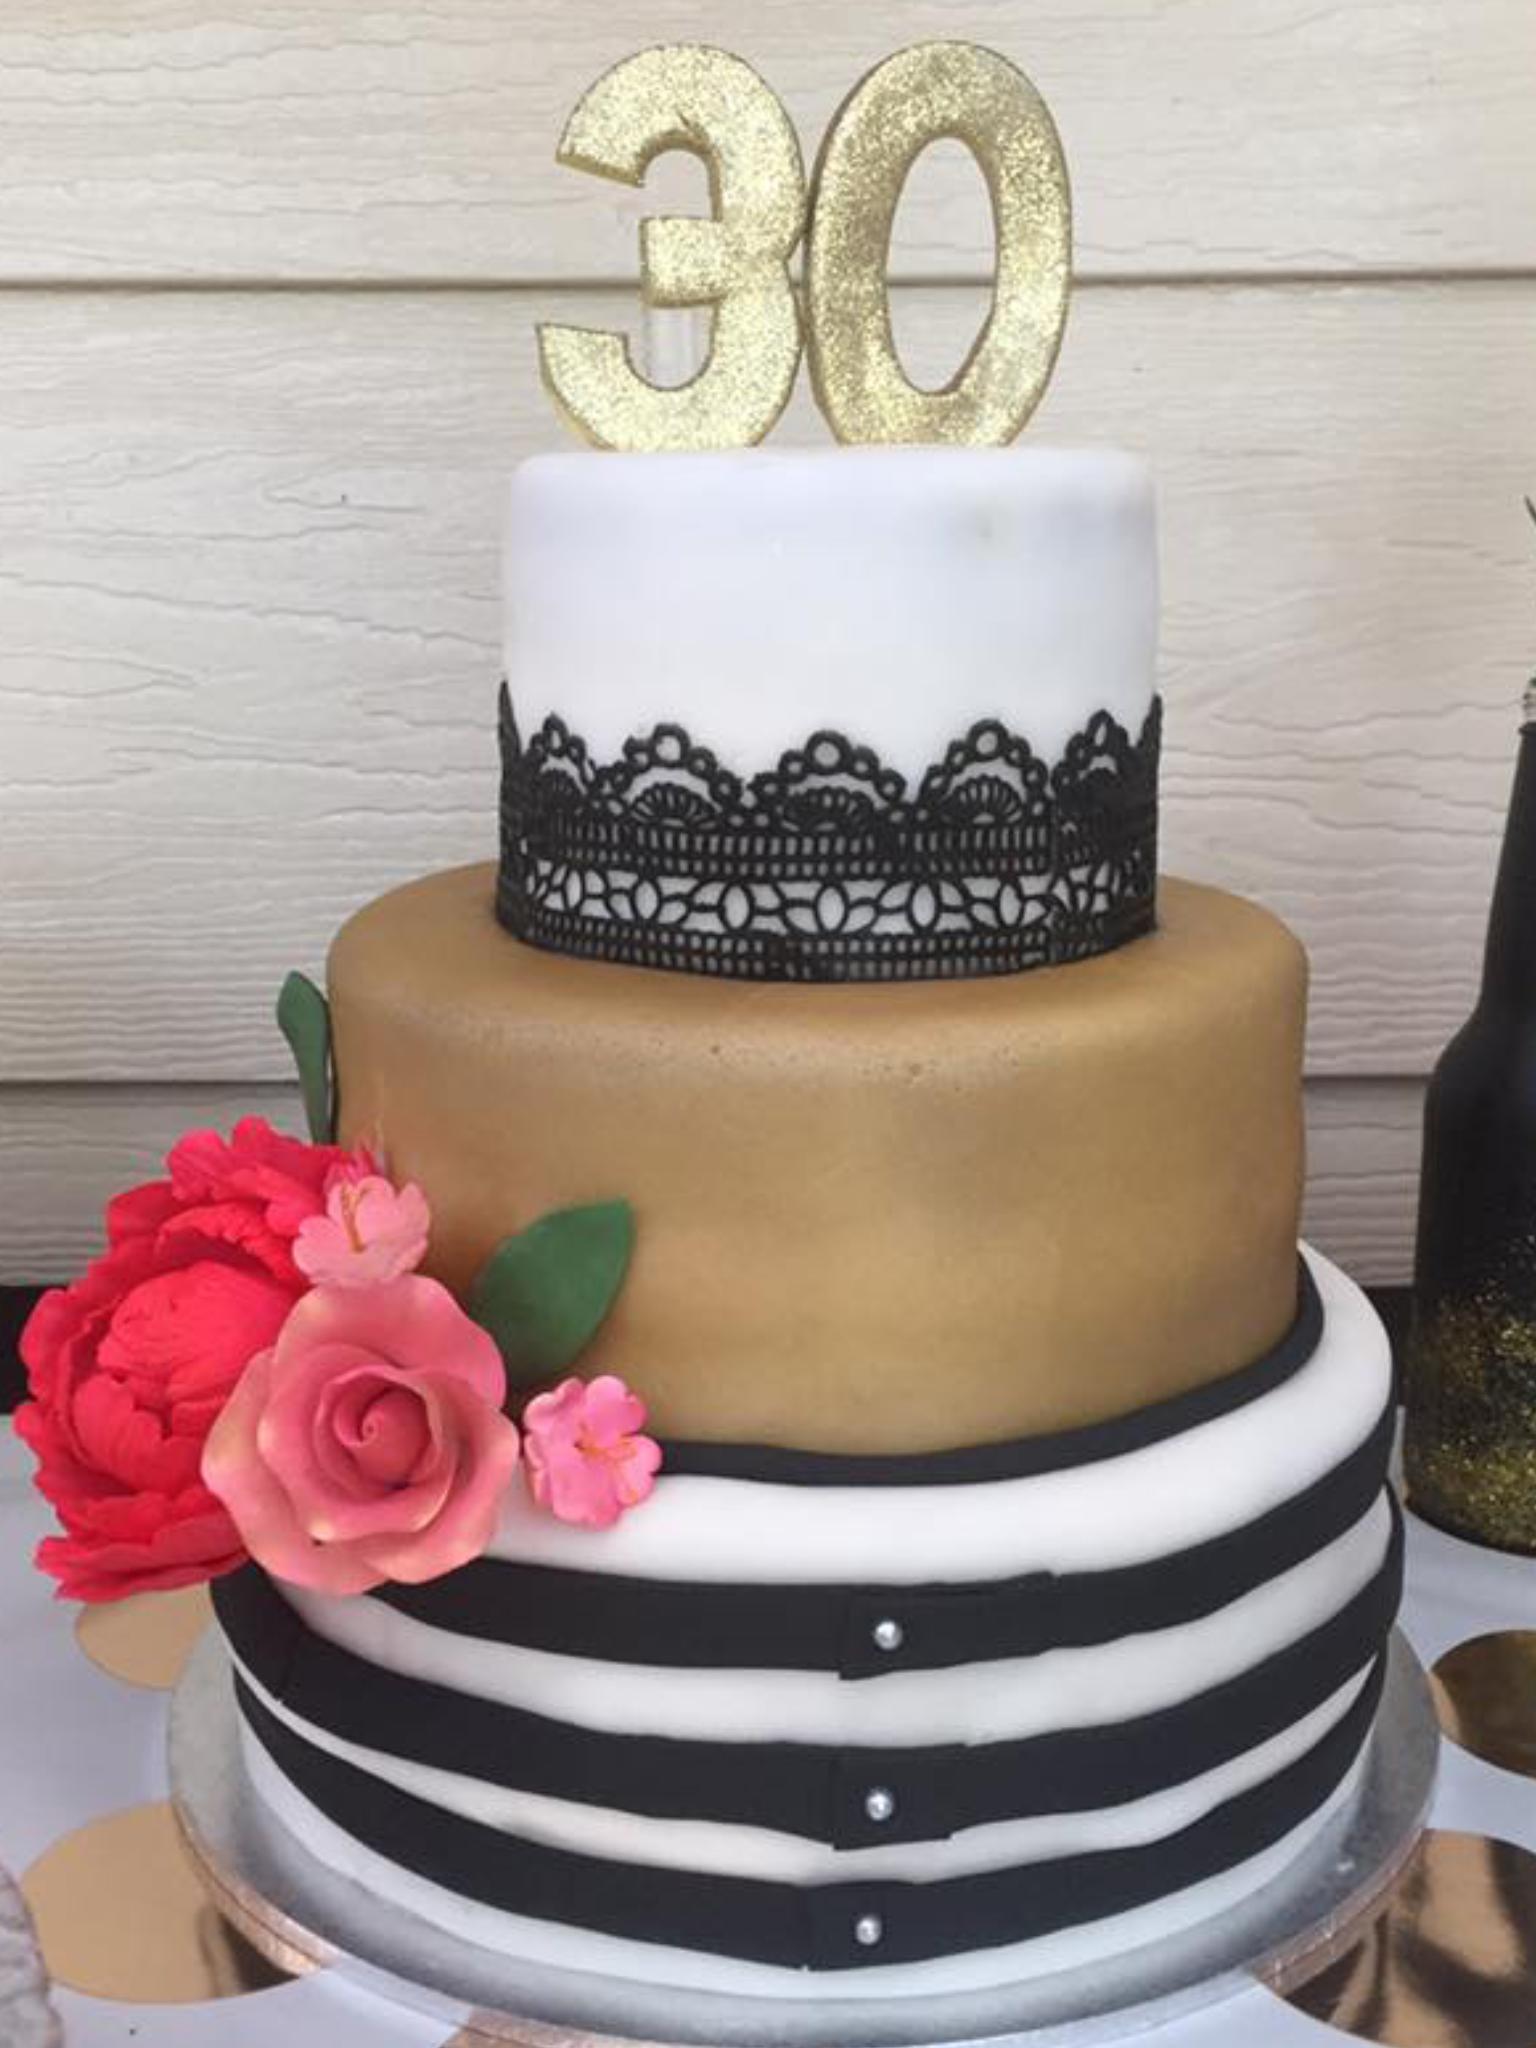 Elegant Black White And Gold 30th Birthday Cake My Cakes